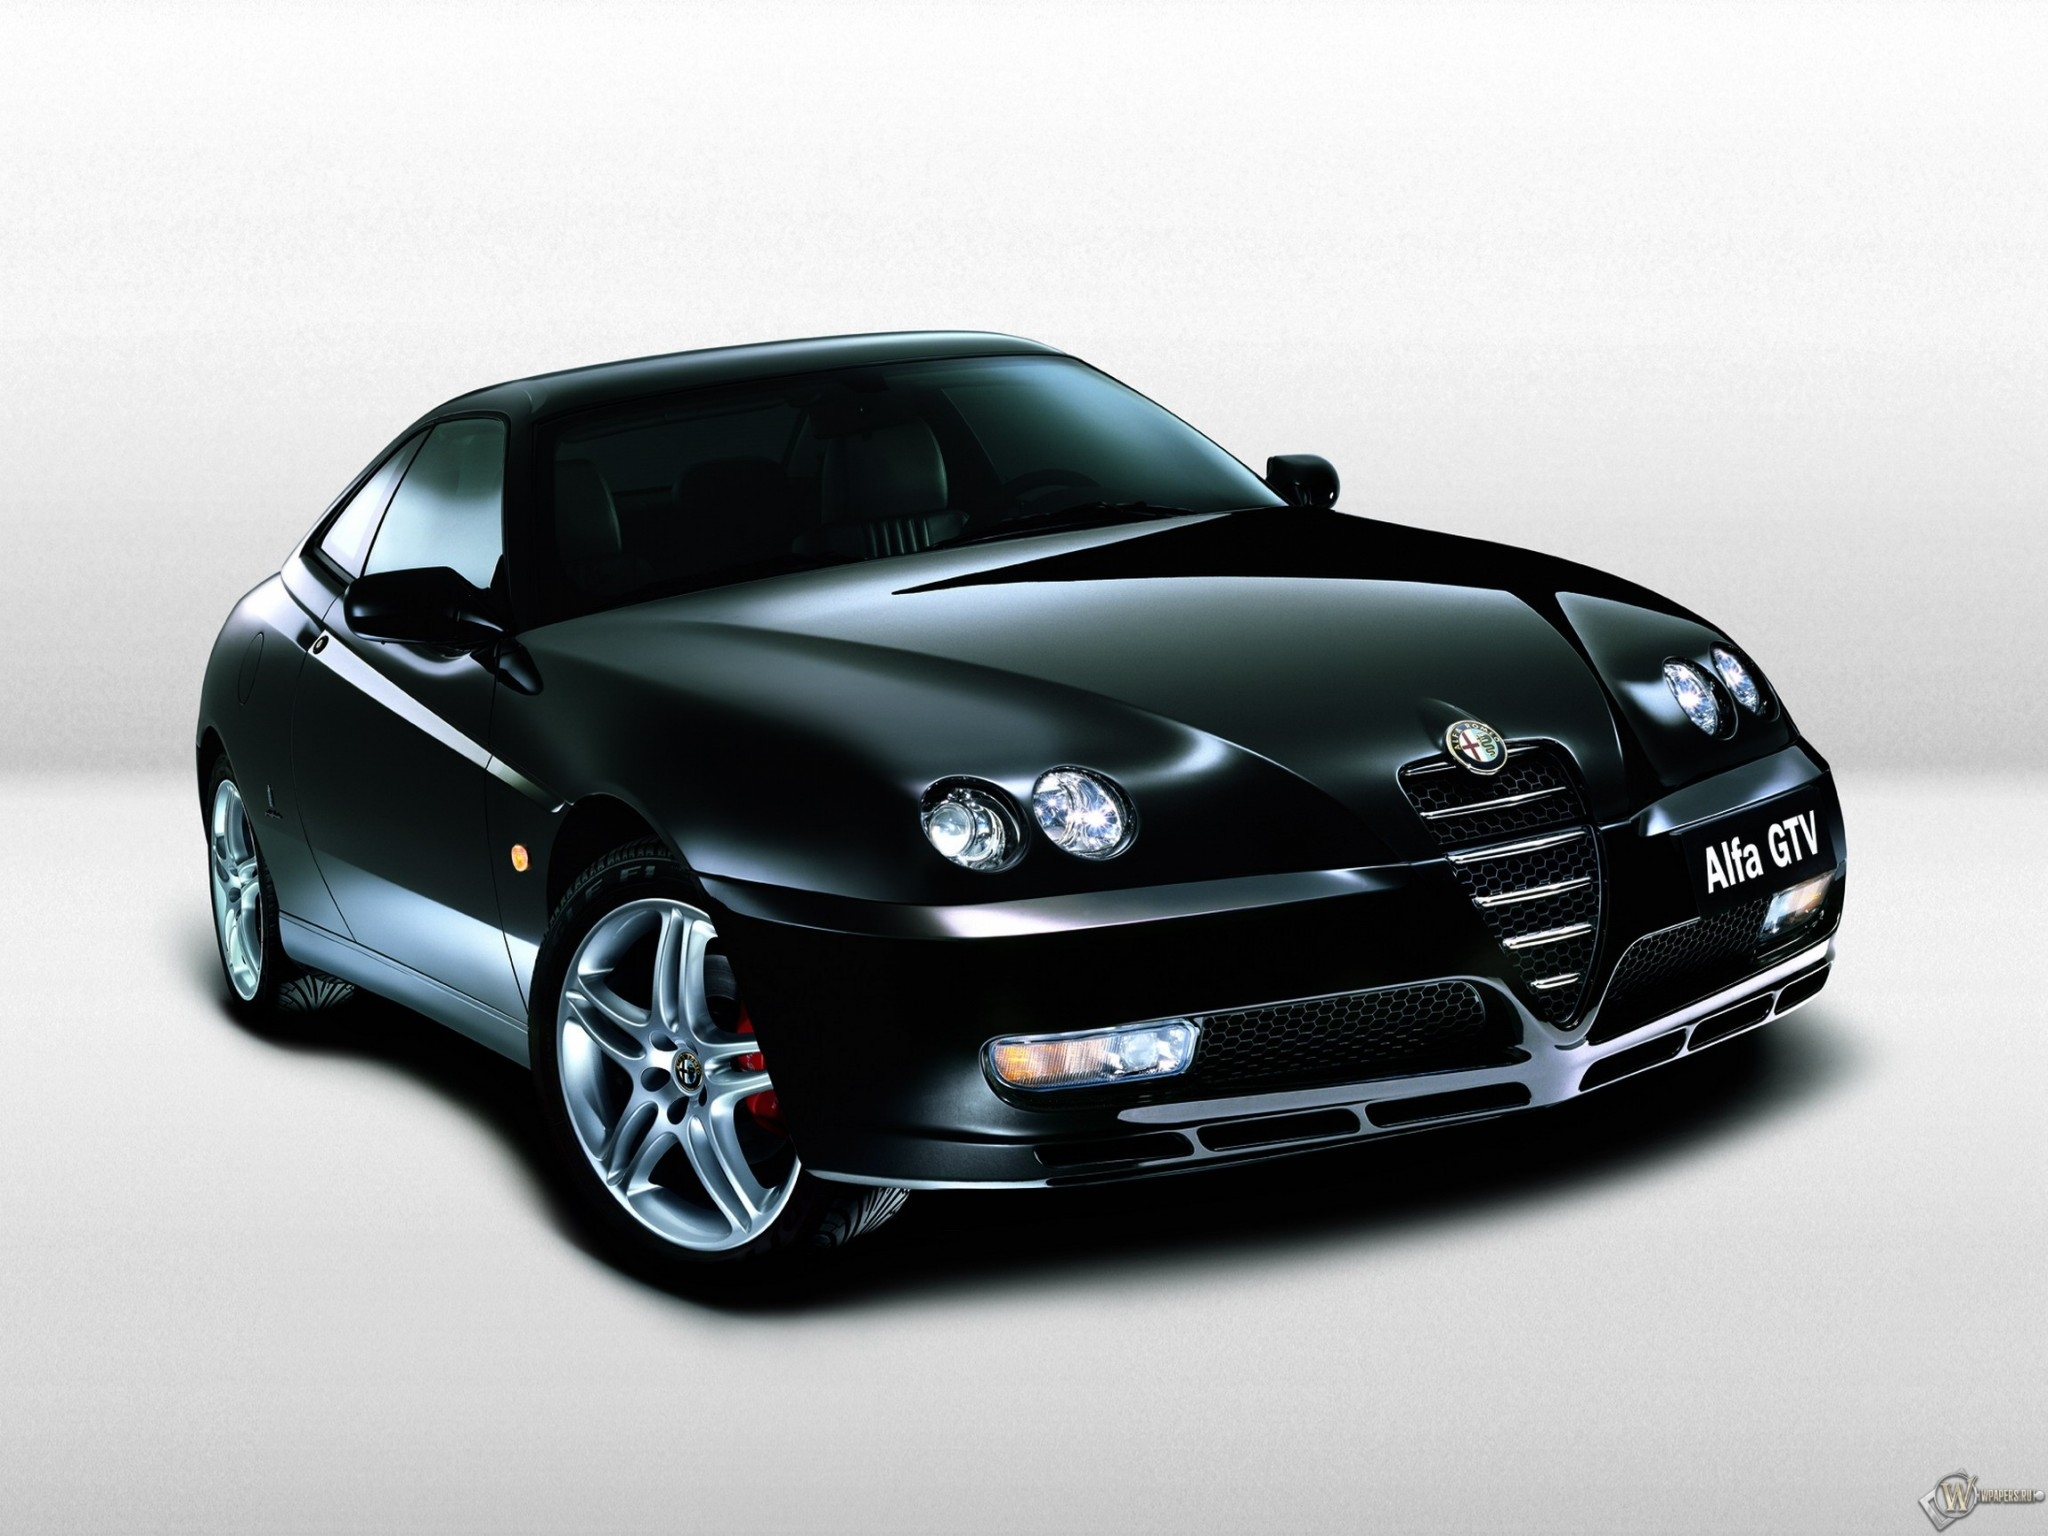 Alfa Romeo GTV (2003) 2048x1536